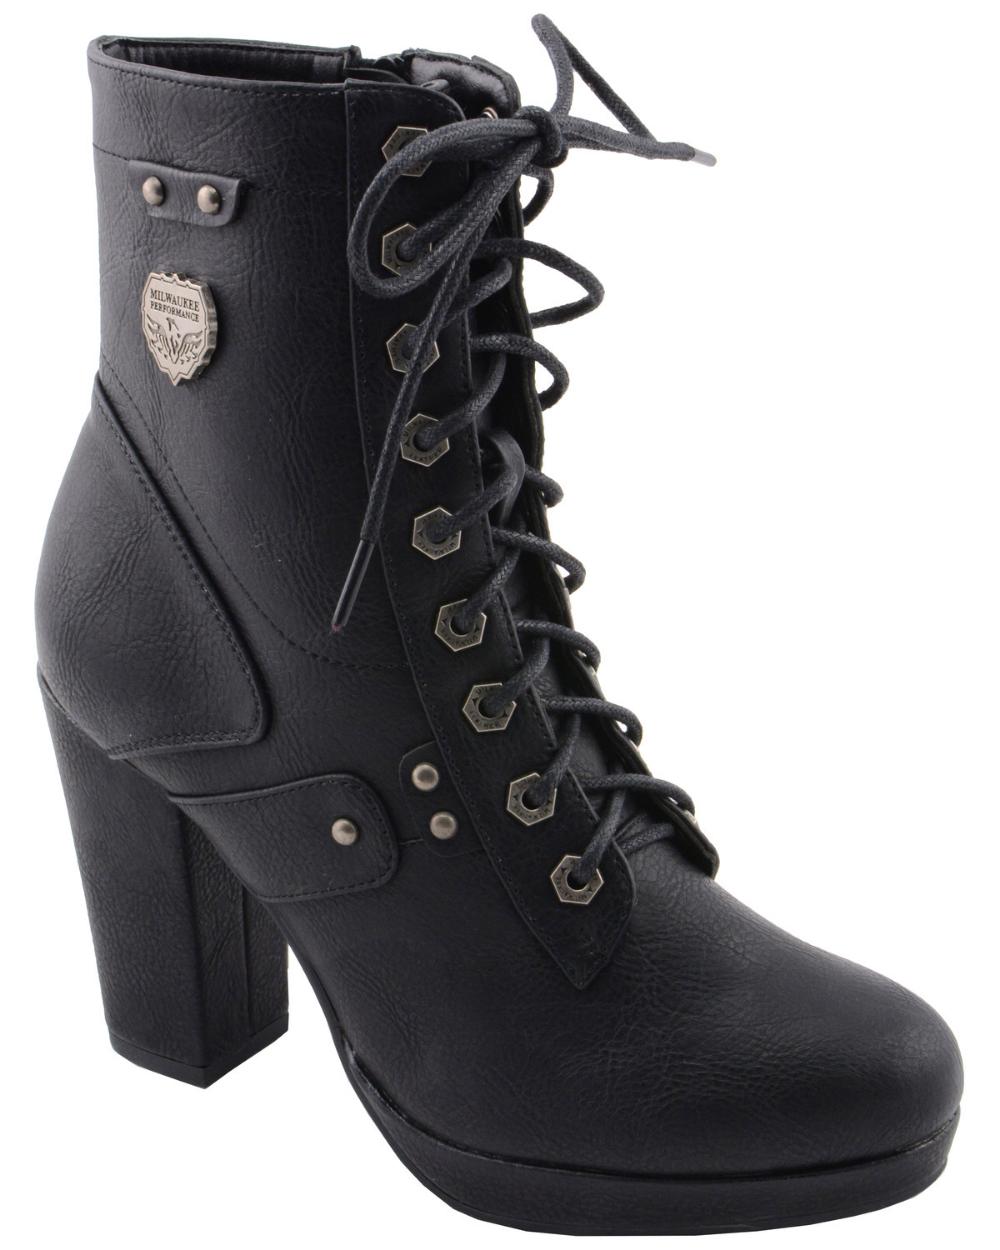 Milwaukee Leather Women's Lace Toe Toe Platform Boots - Round Toe